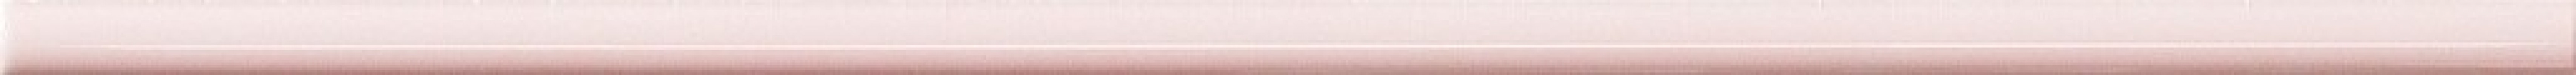 Бордюр Antica Ceramica Rubiera Alterego List. Rosa 1x40 201429